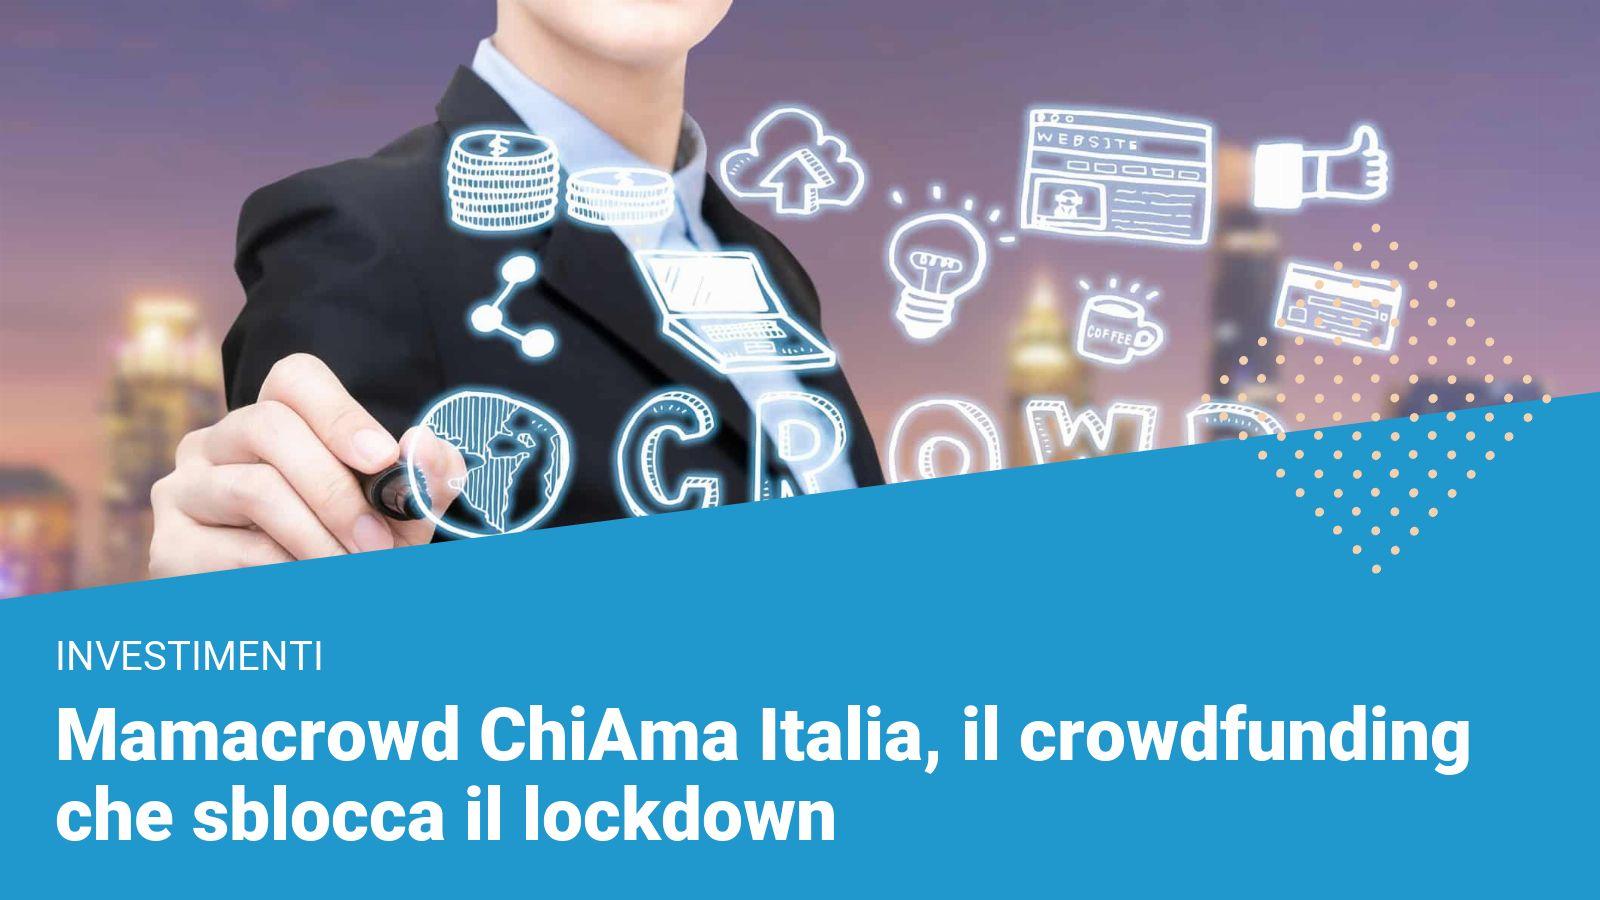 Mamacrowd ChiAma Italia - Financer.com Italia